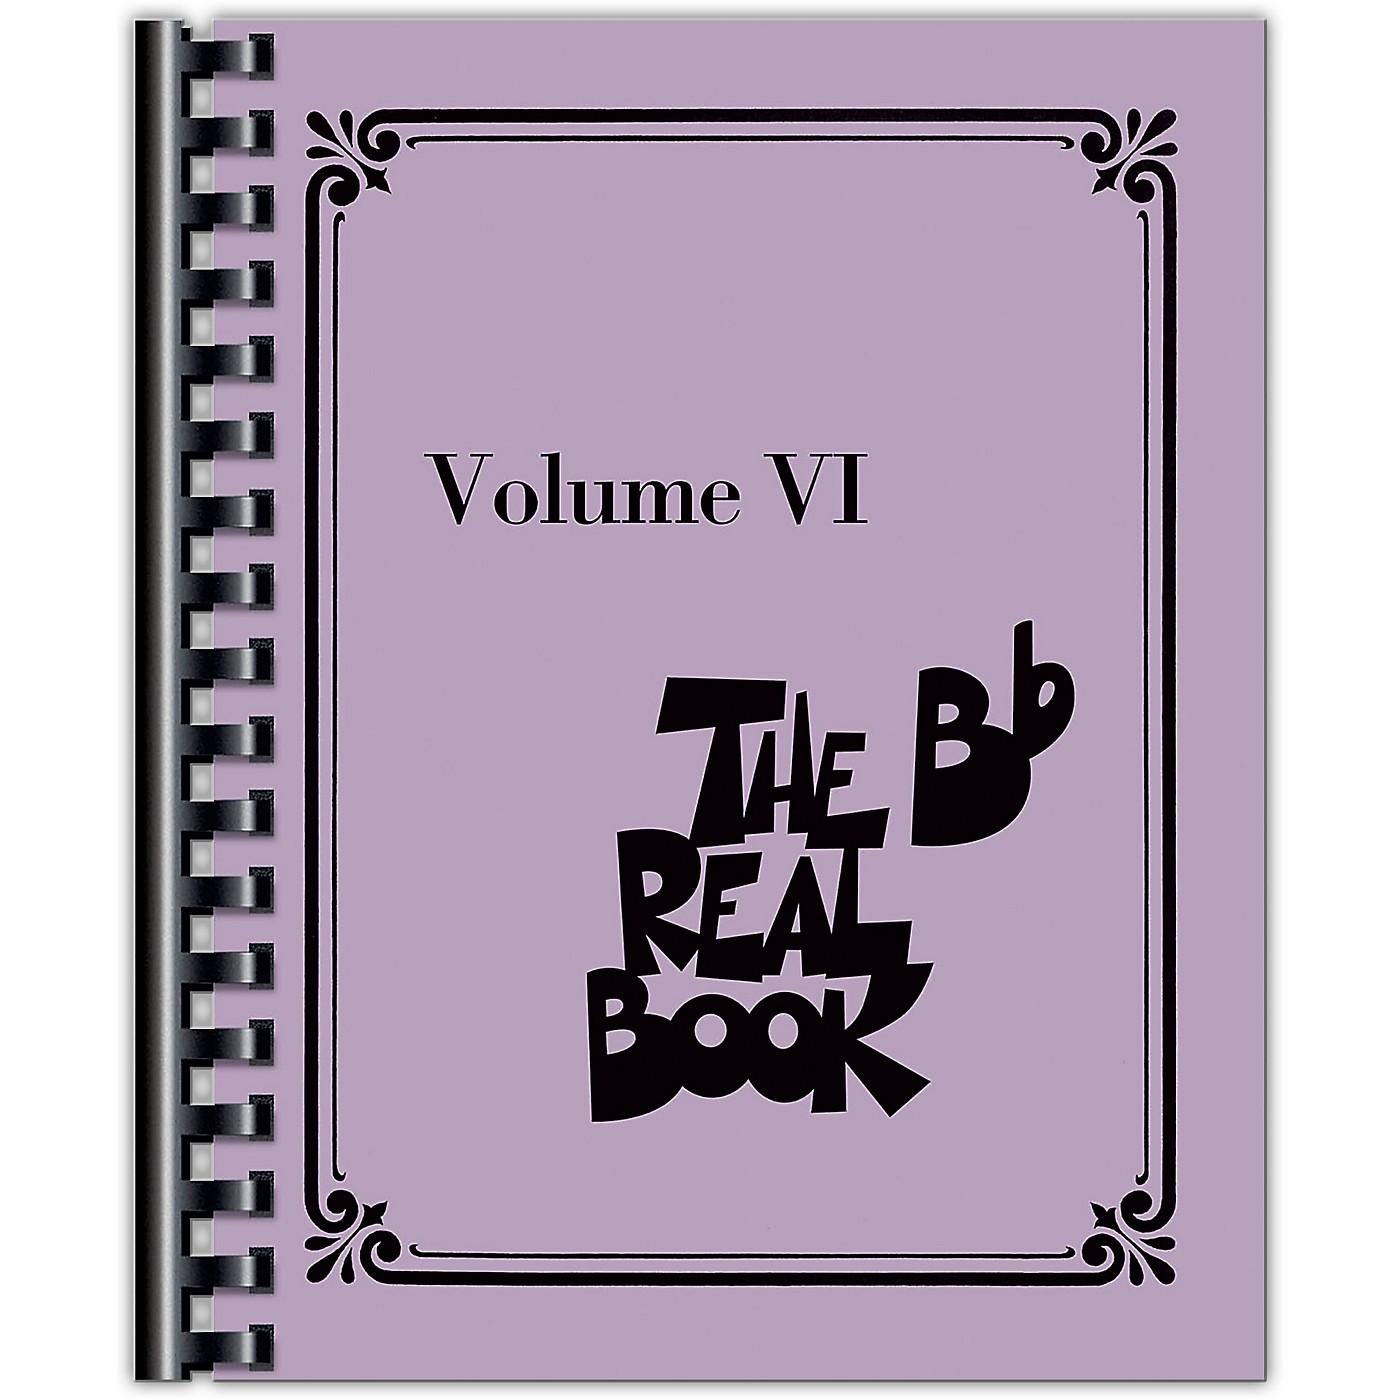 Hal Leonard The Real Book - Volume VI (B-Flat Instruments) Fake Book Series Softcover thumbnail